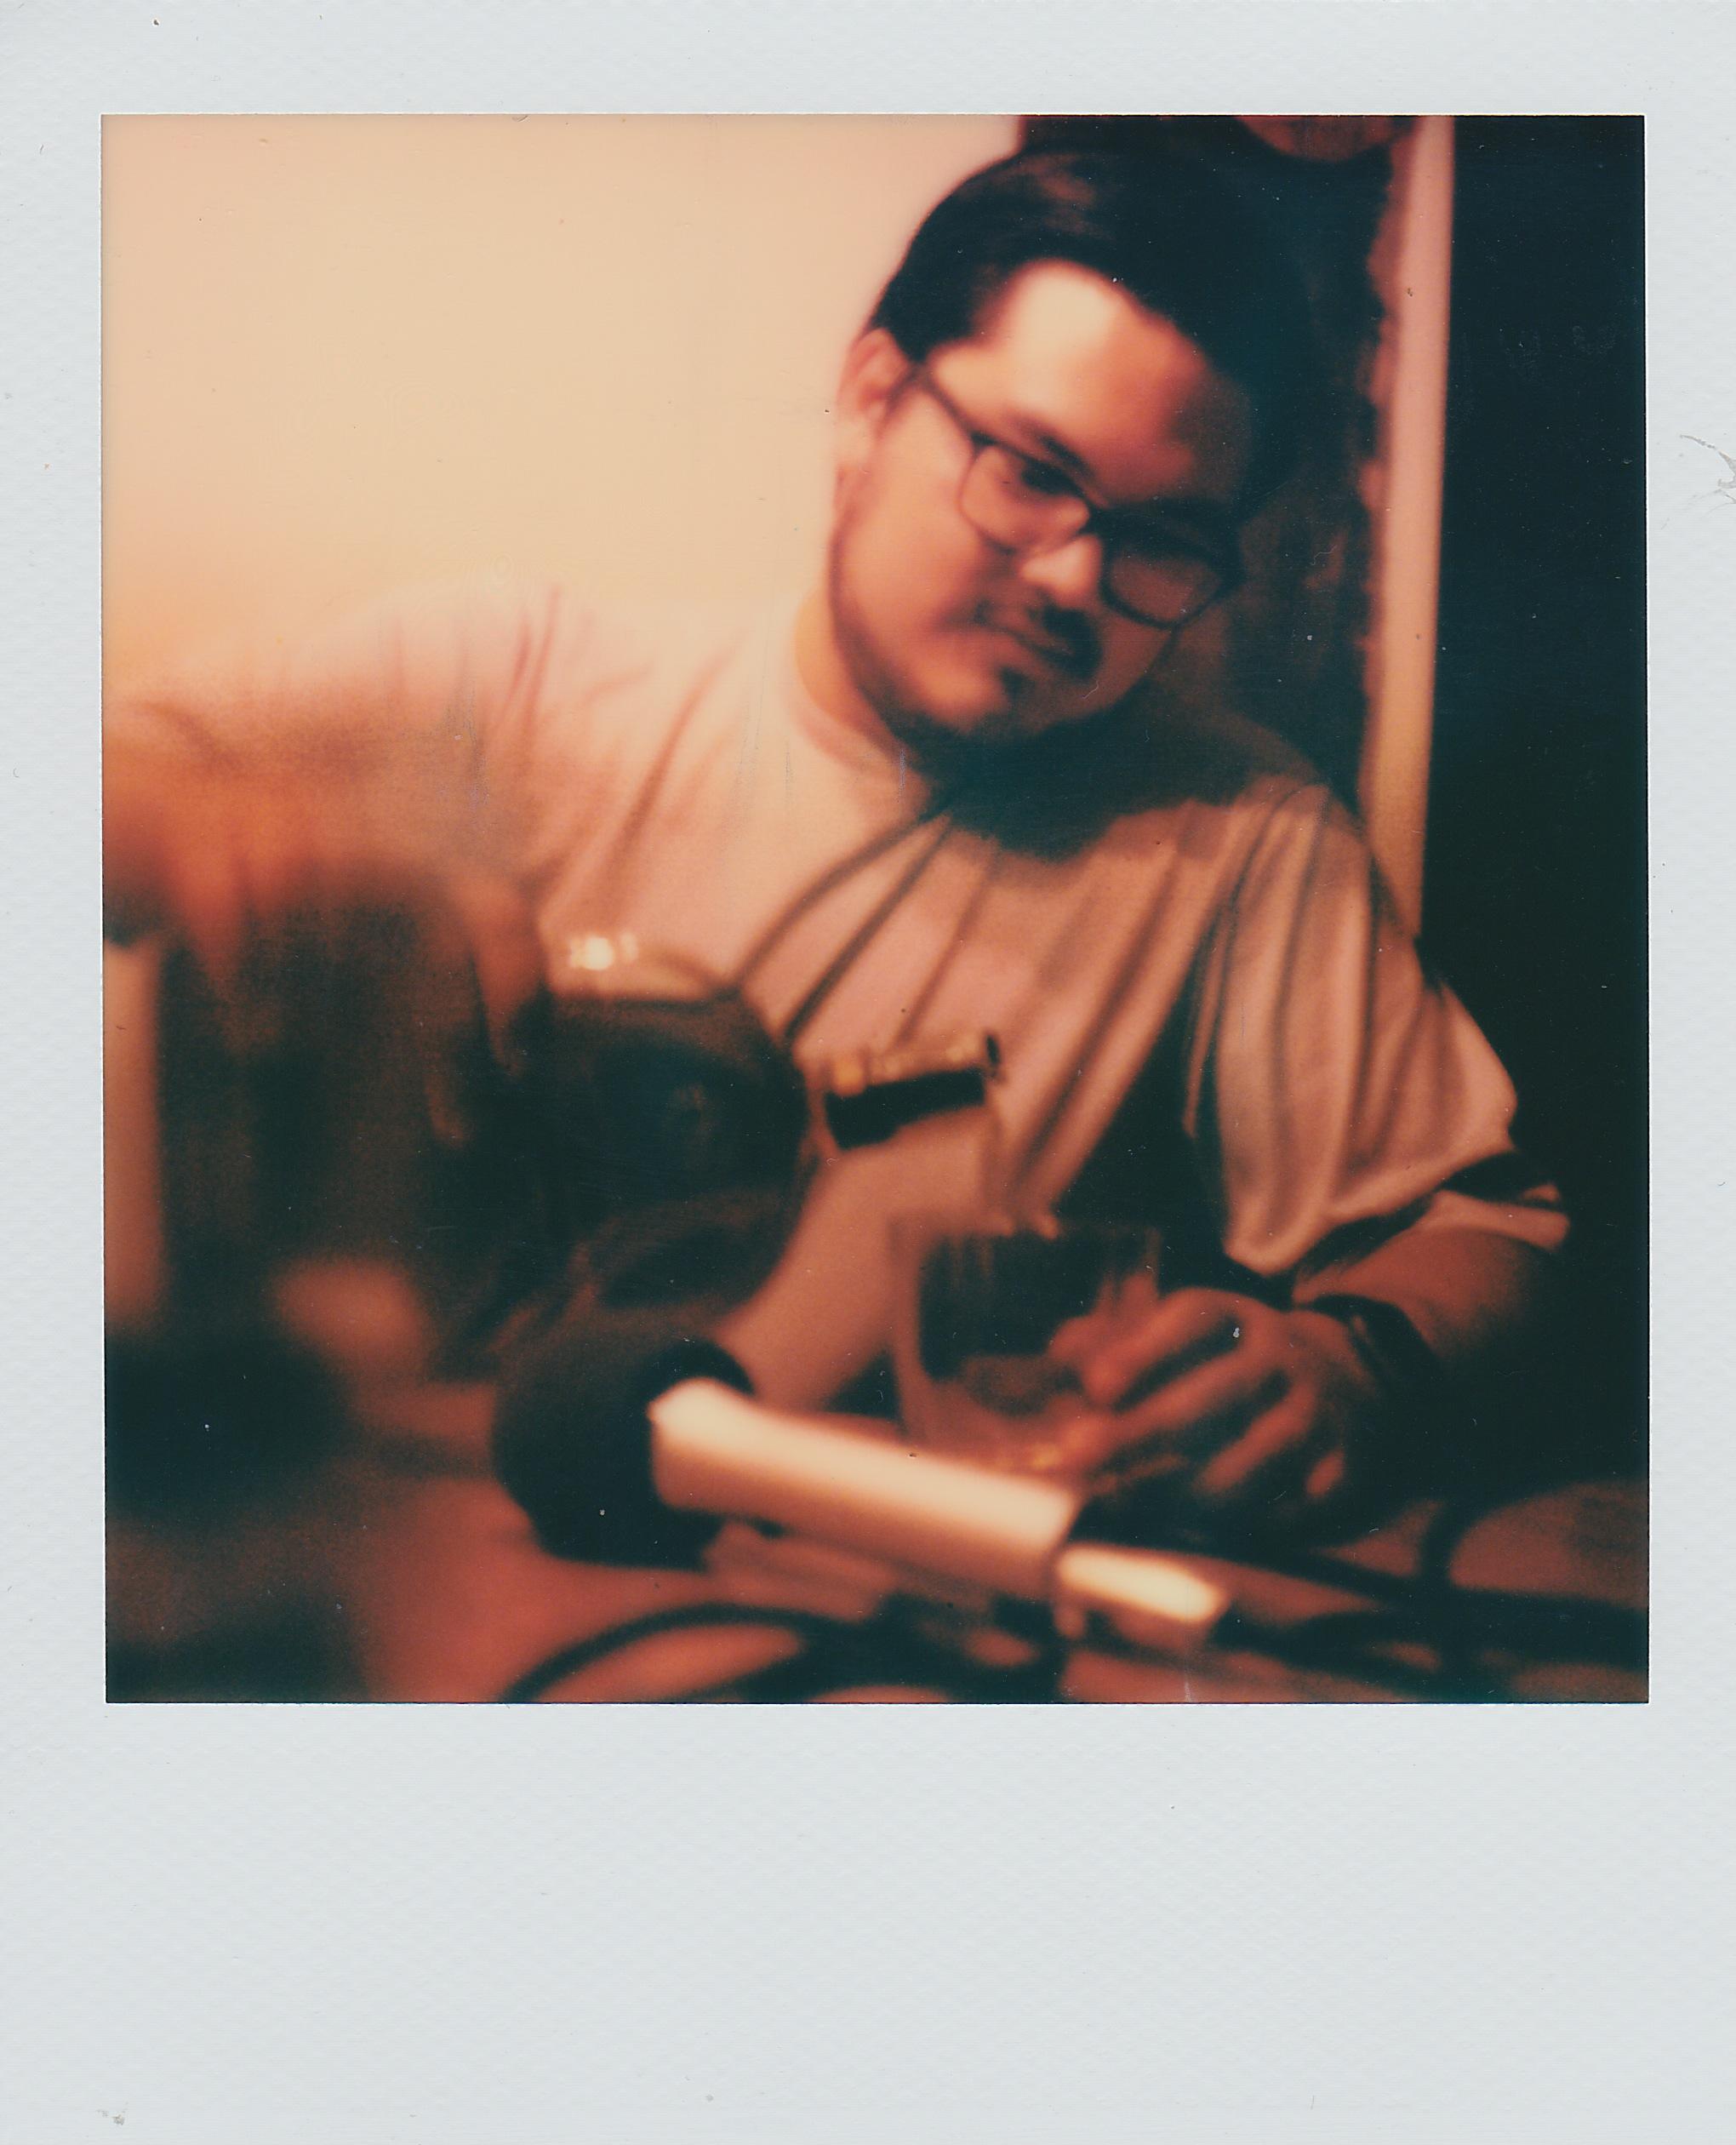 Podcast Polaroid of Greg Steele